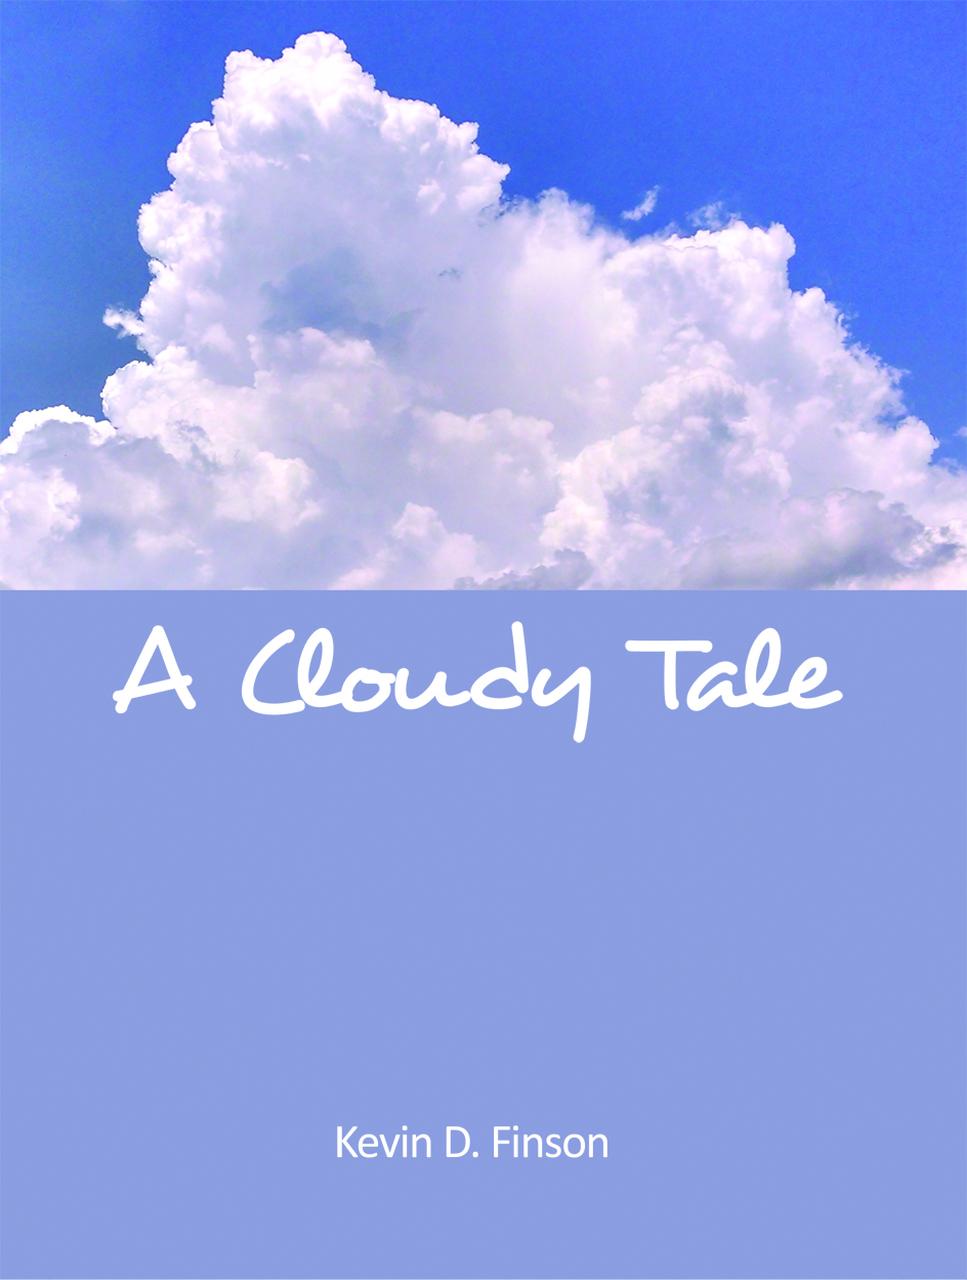 A Cloudy Tale